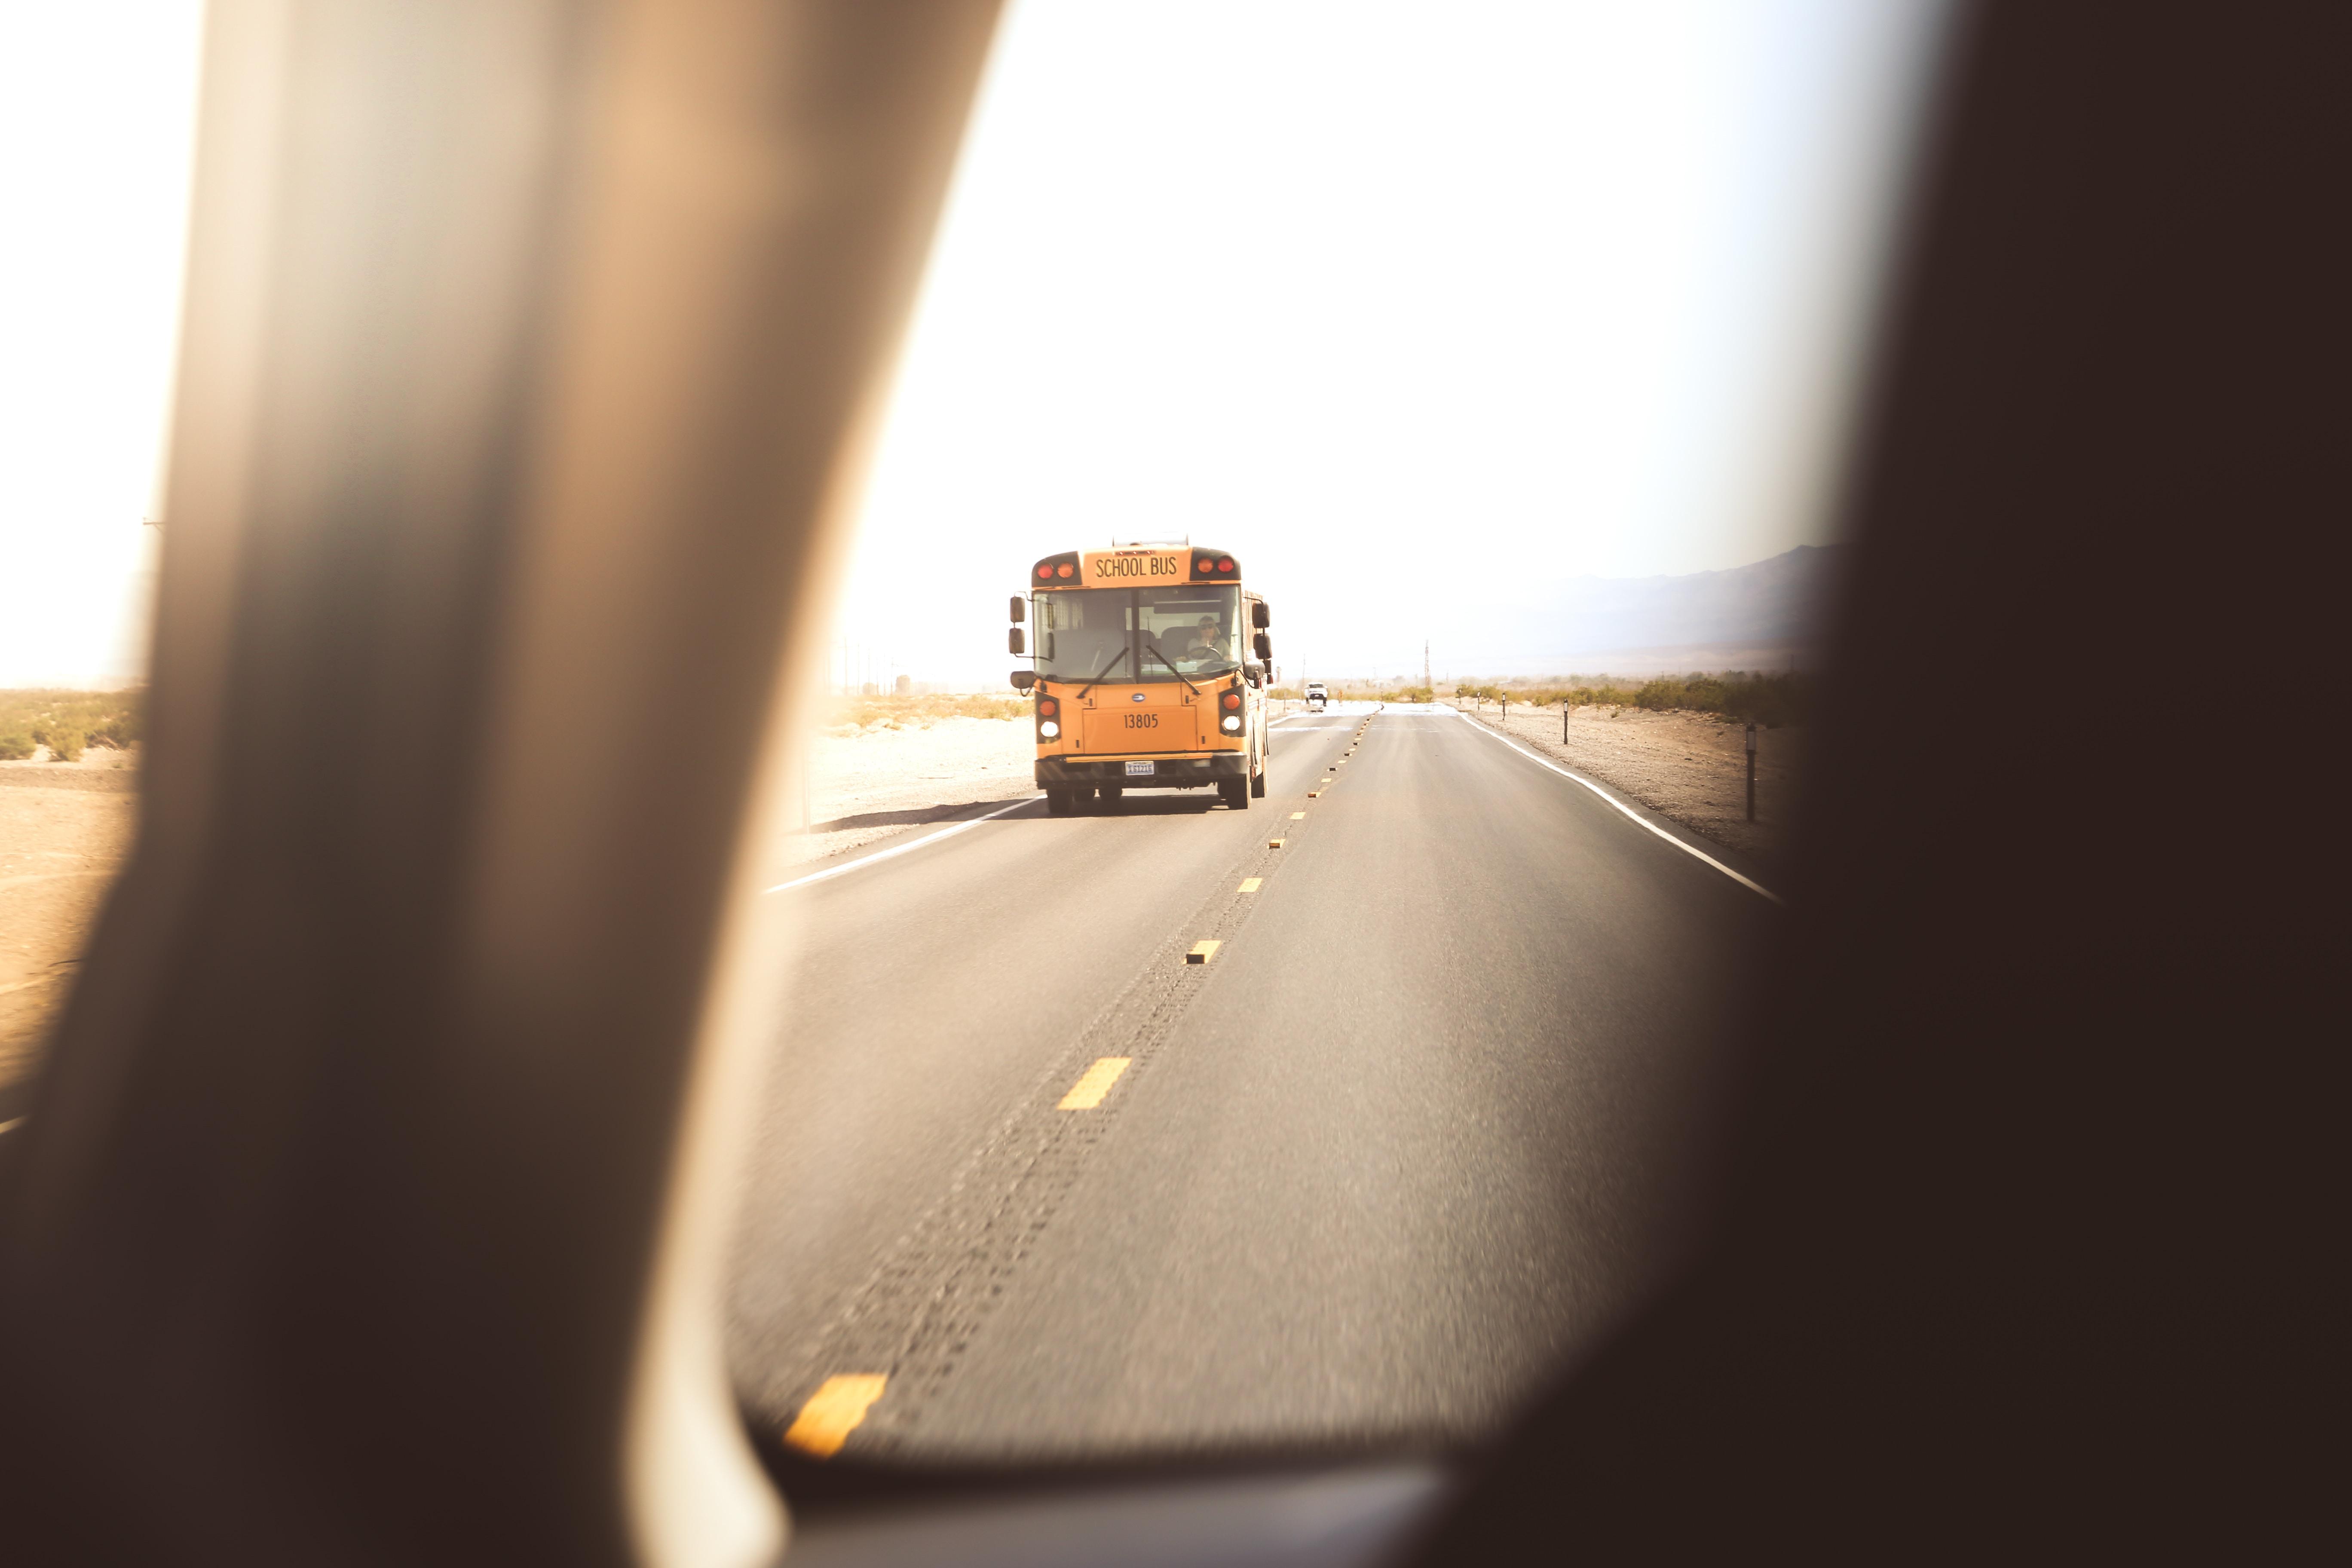 yellow class a motorhome on roadway